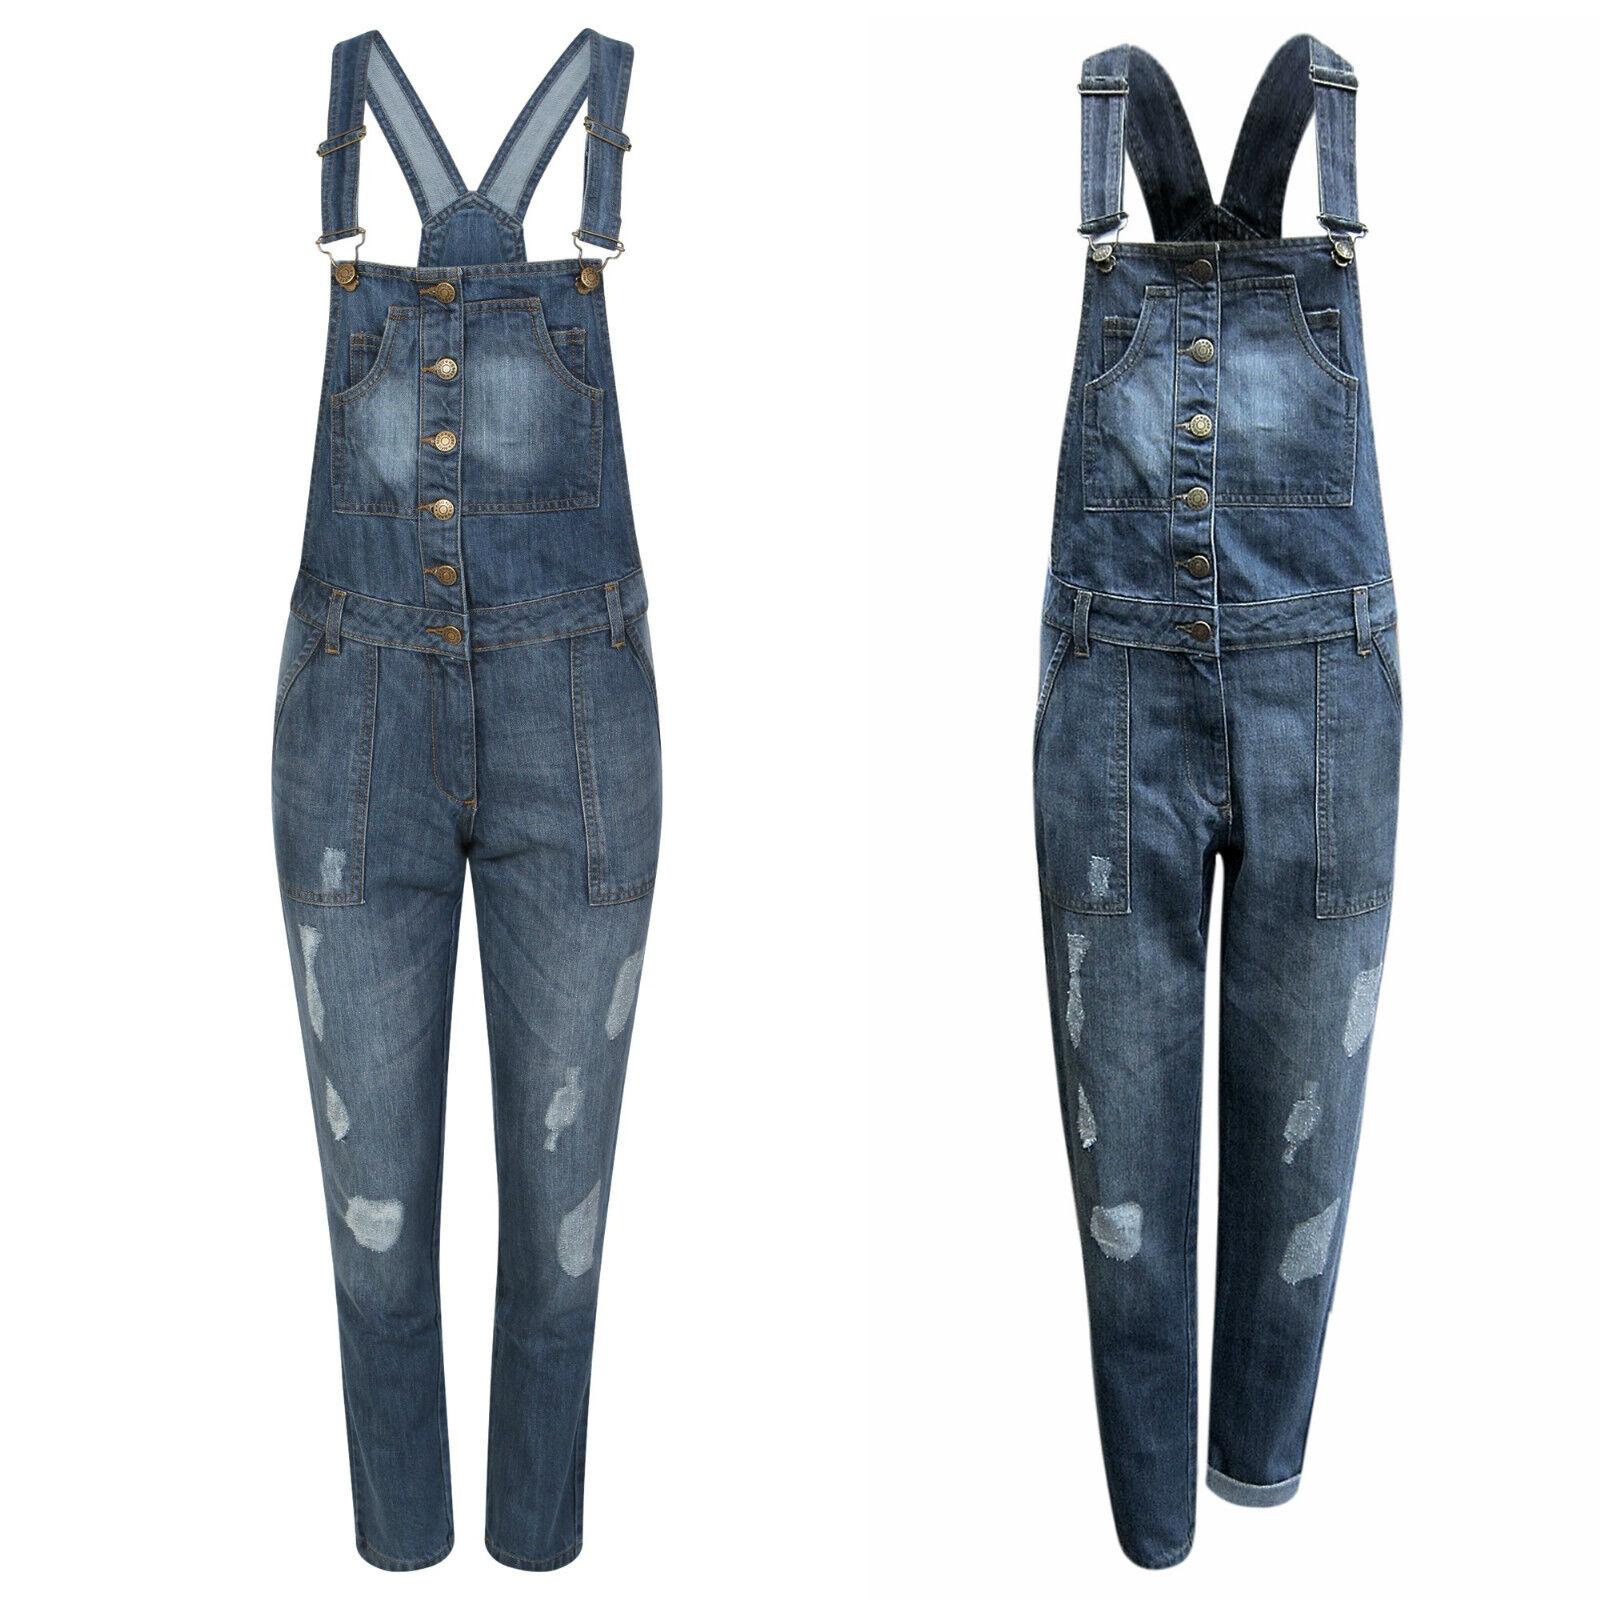 Womens Ladies Dungaree Gina Denim Jeans Full Slim Fit Ripped Knee Wash Jumpsuit